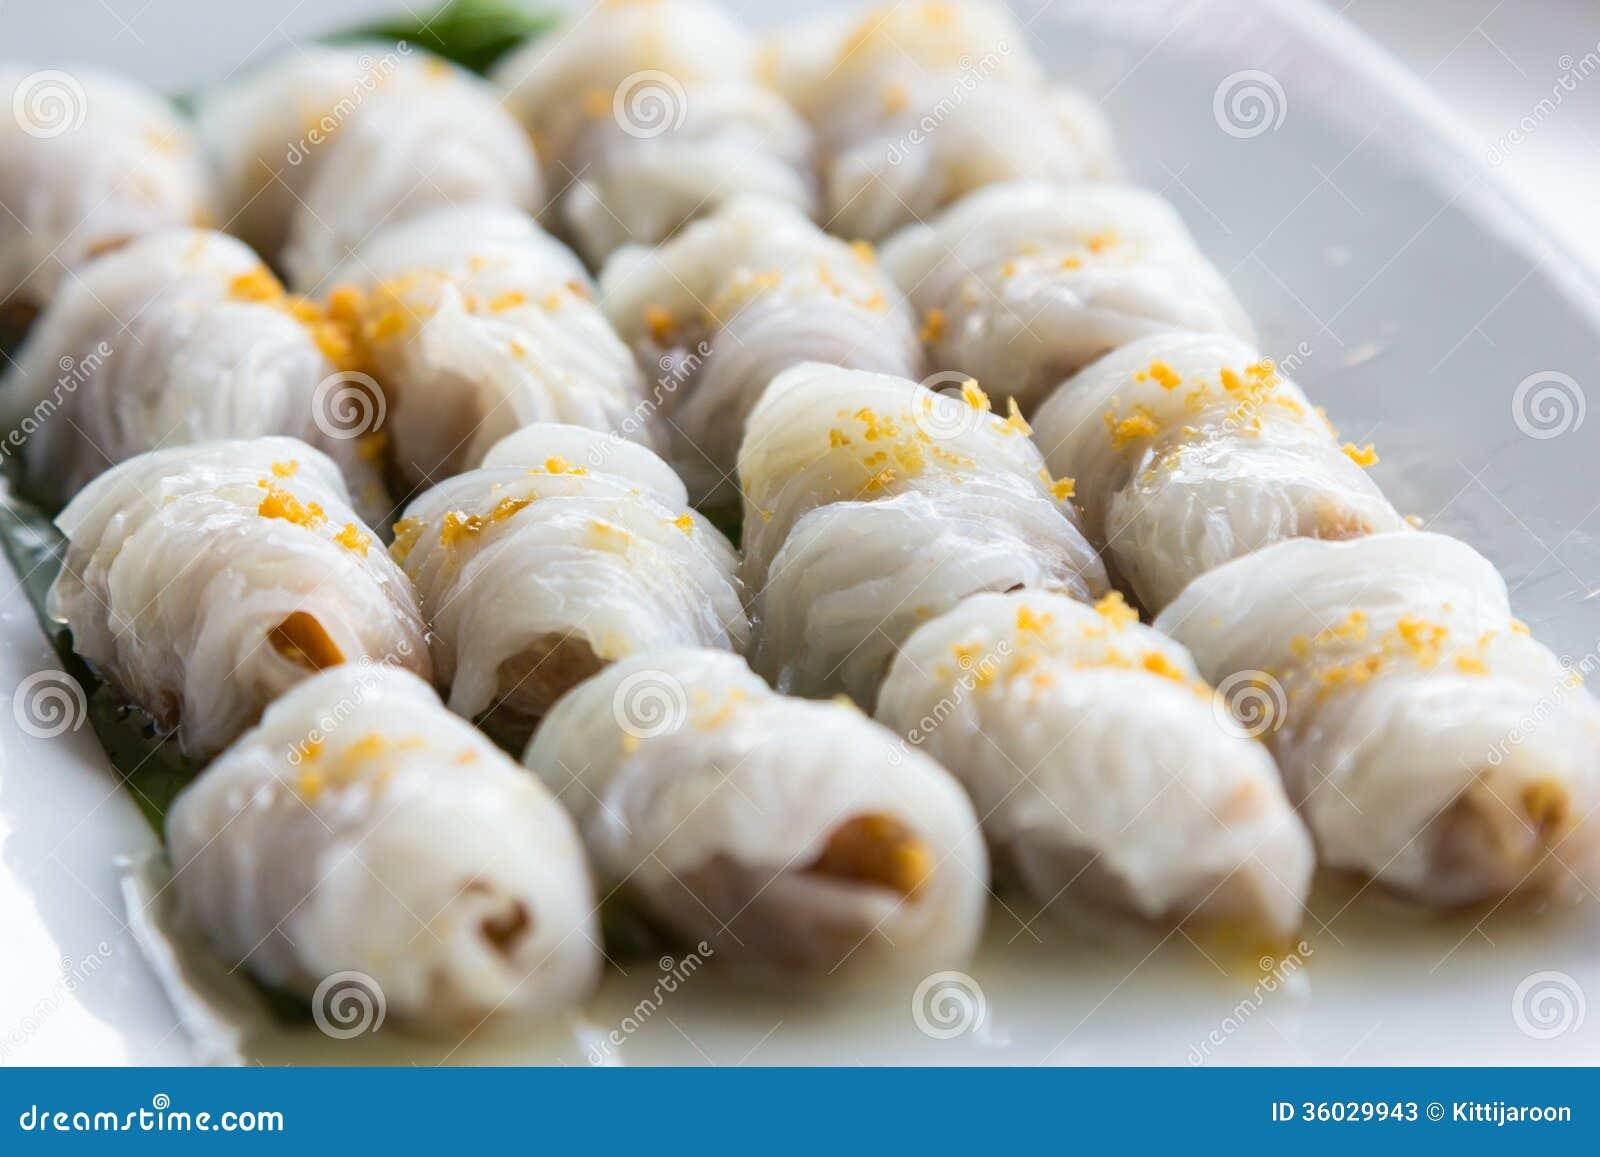 how to make chinese dumplings skin